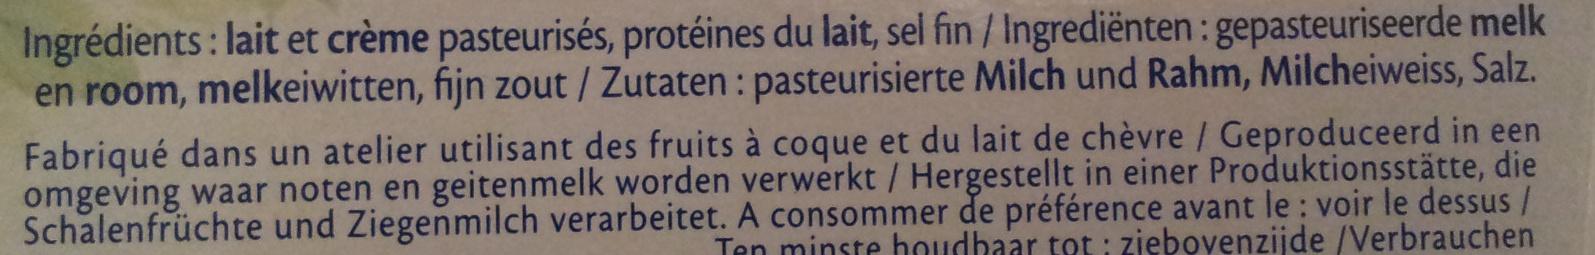 Le Goût Primeur - Fromage - Ingredients - fr